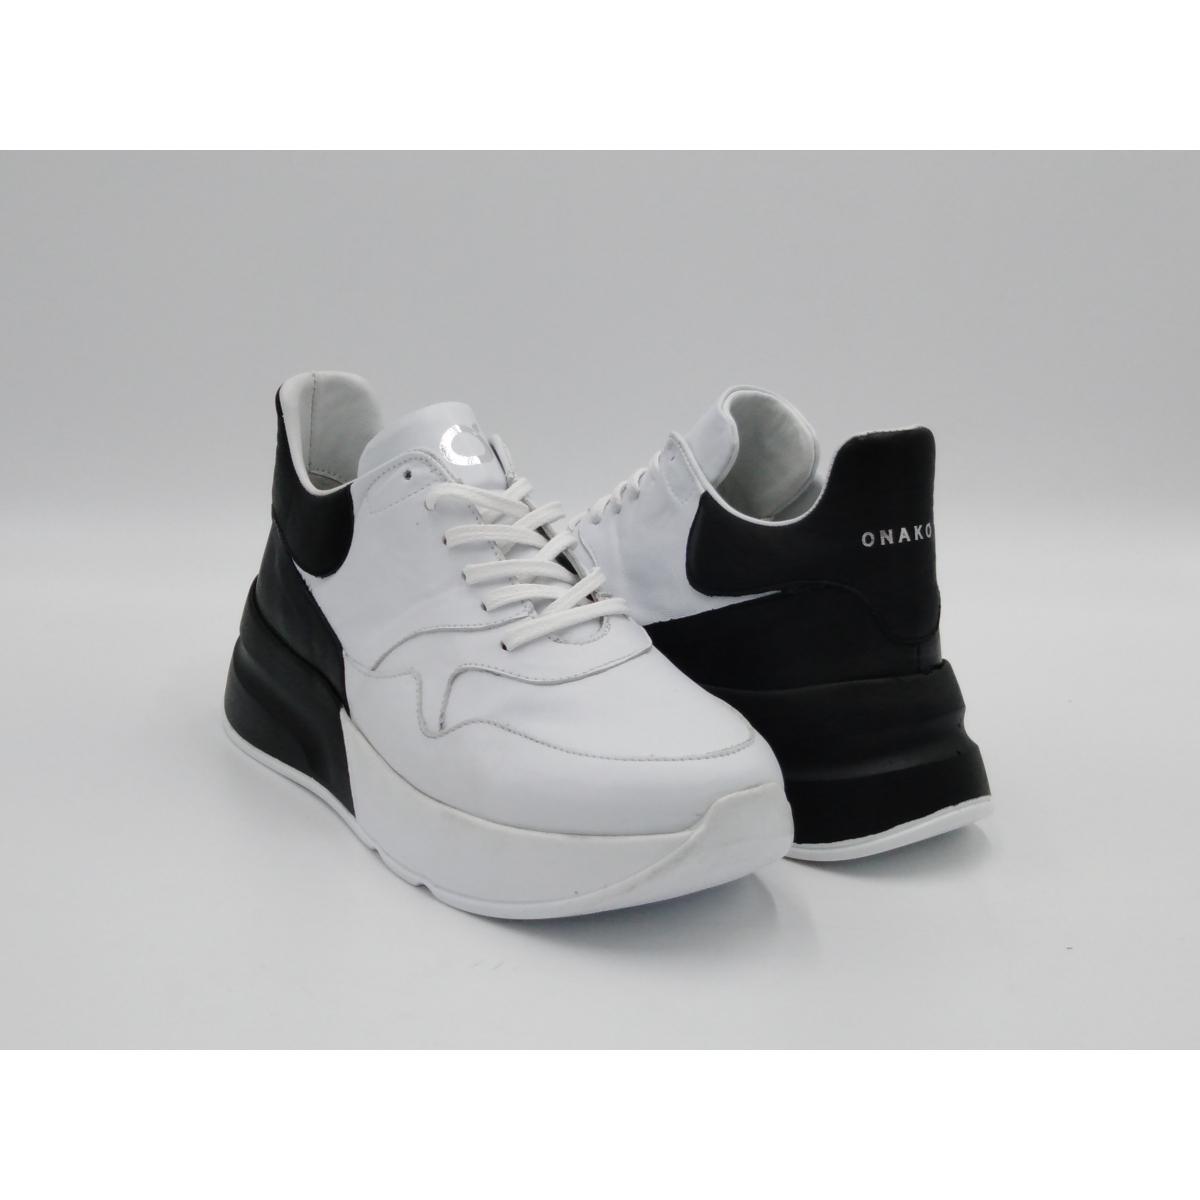 Onakò -Sneaker bianco nera...